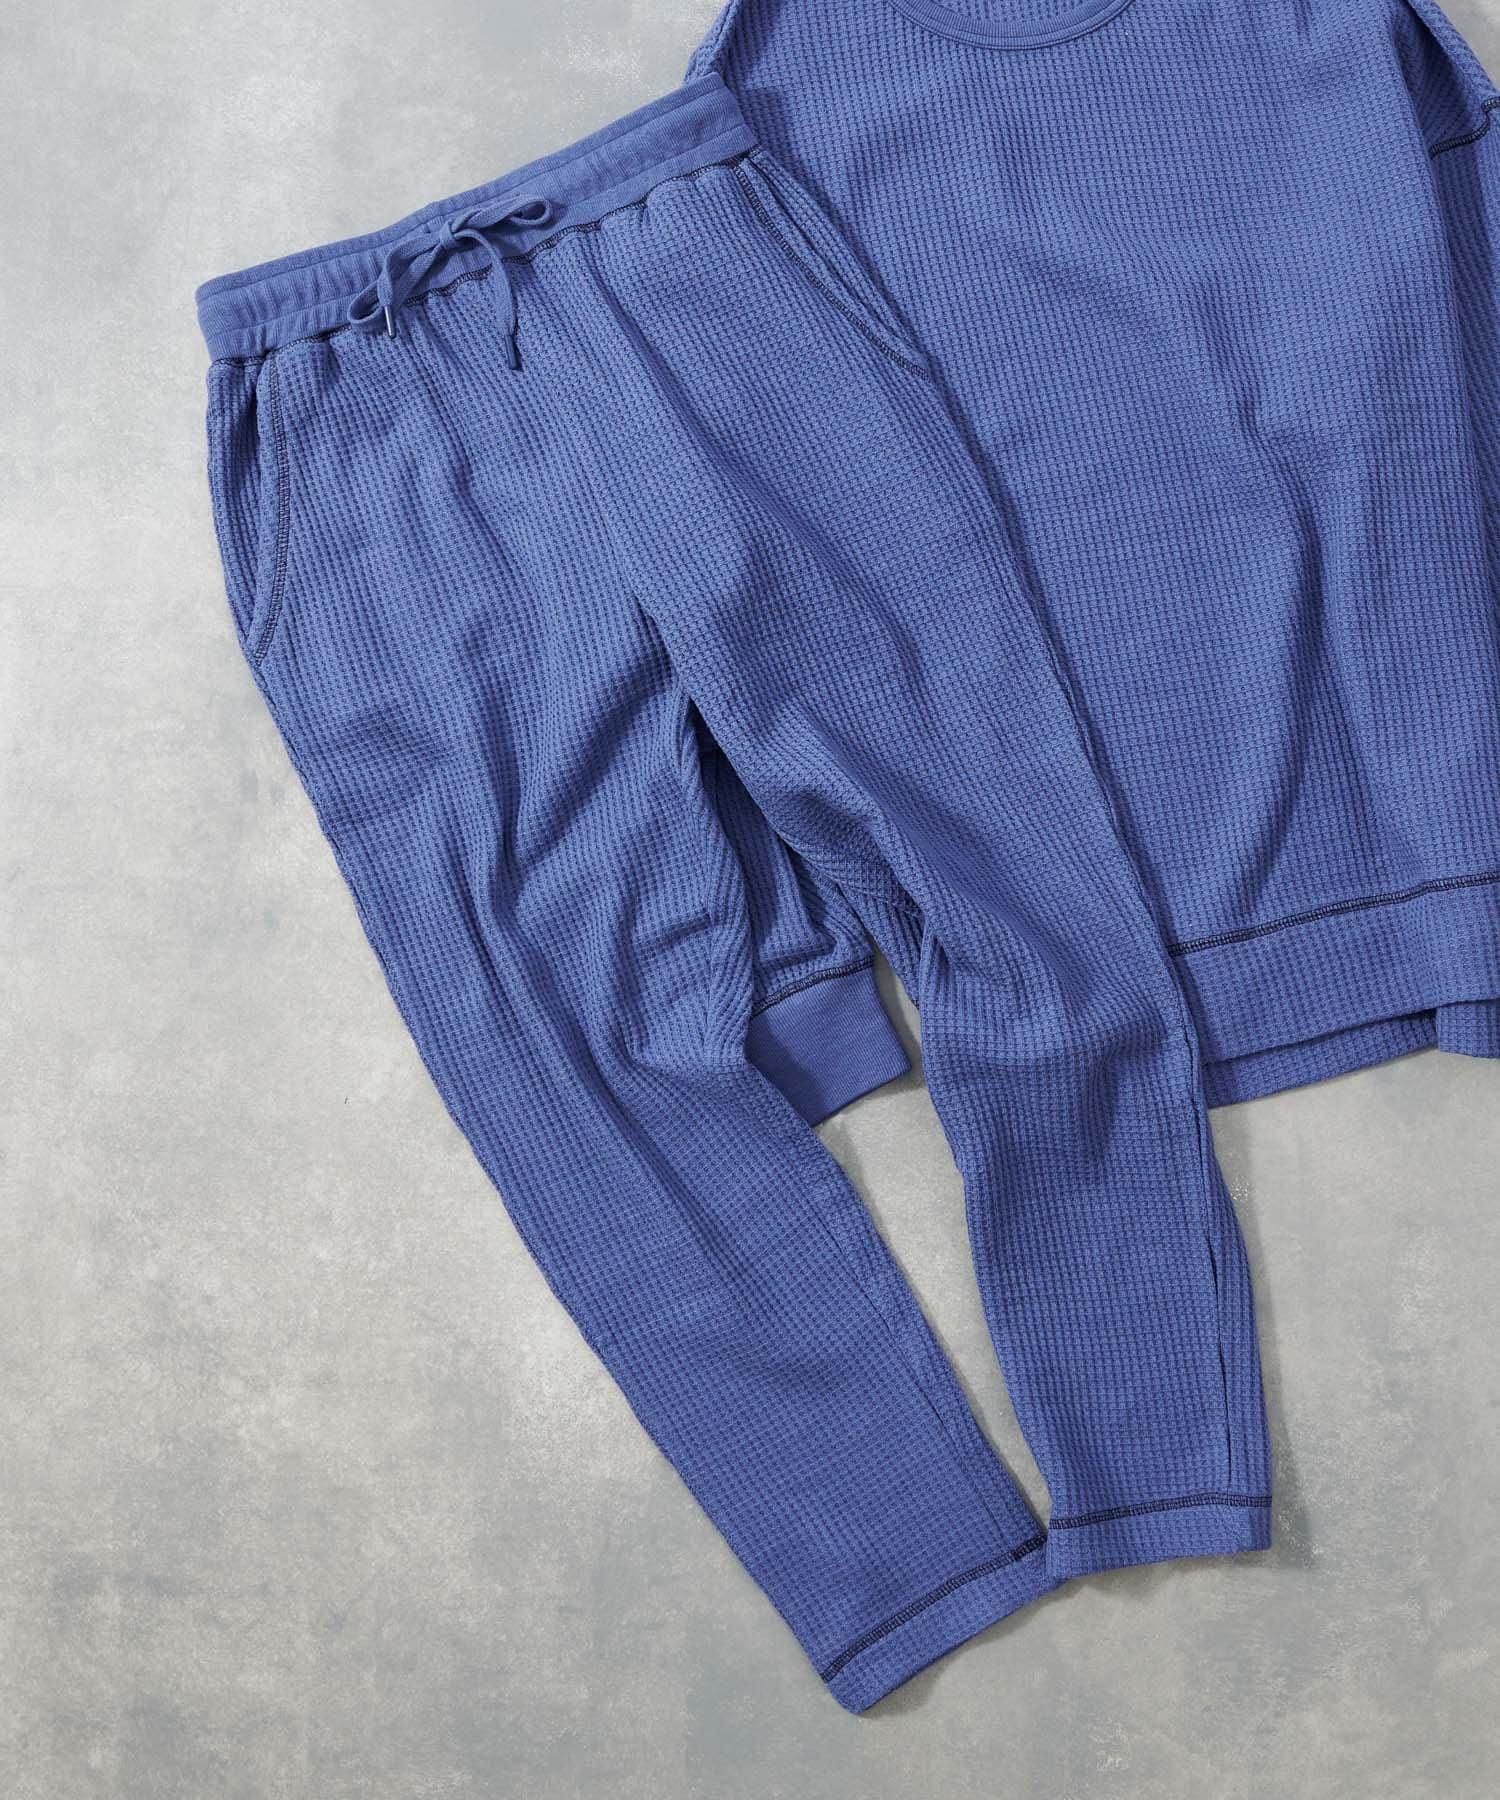 COLONY 2139(コロニー トゥーワンスリーナイン) メンズ 【MEN'S】配色ステッチワッフルロングパンツ/ルームウェア (セットアップ可) ブルー